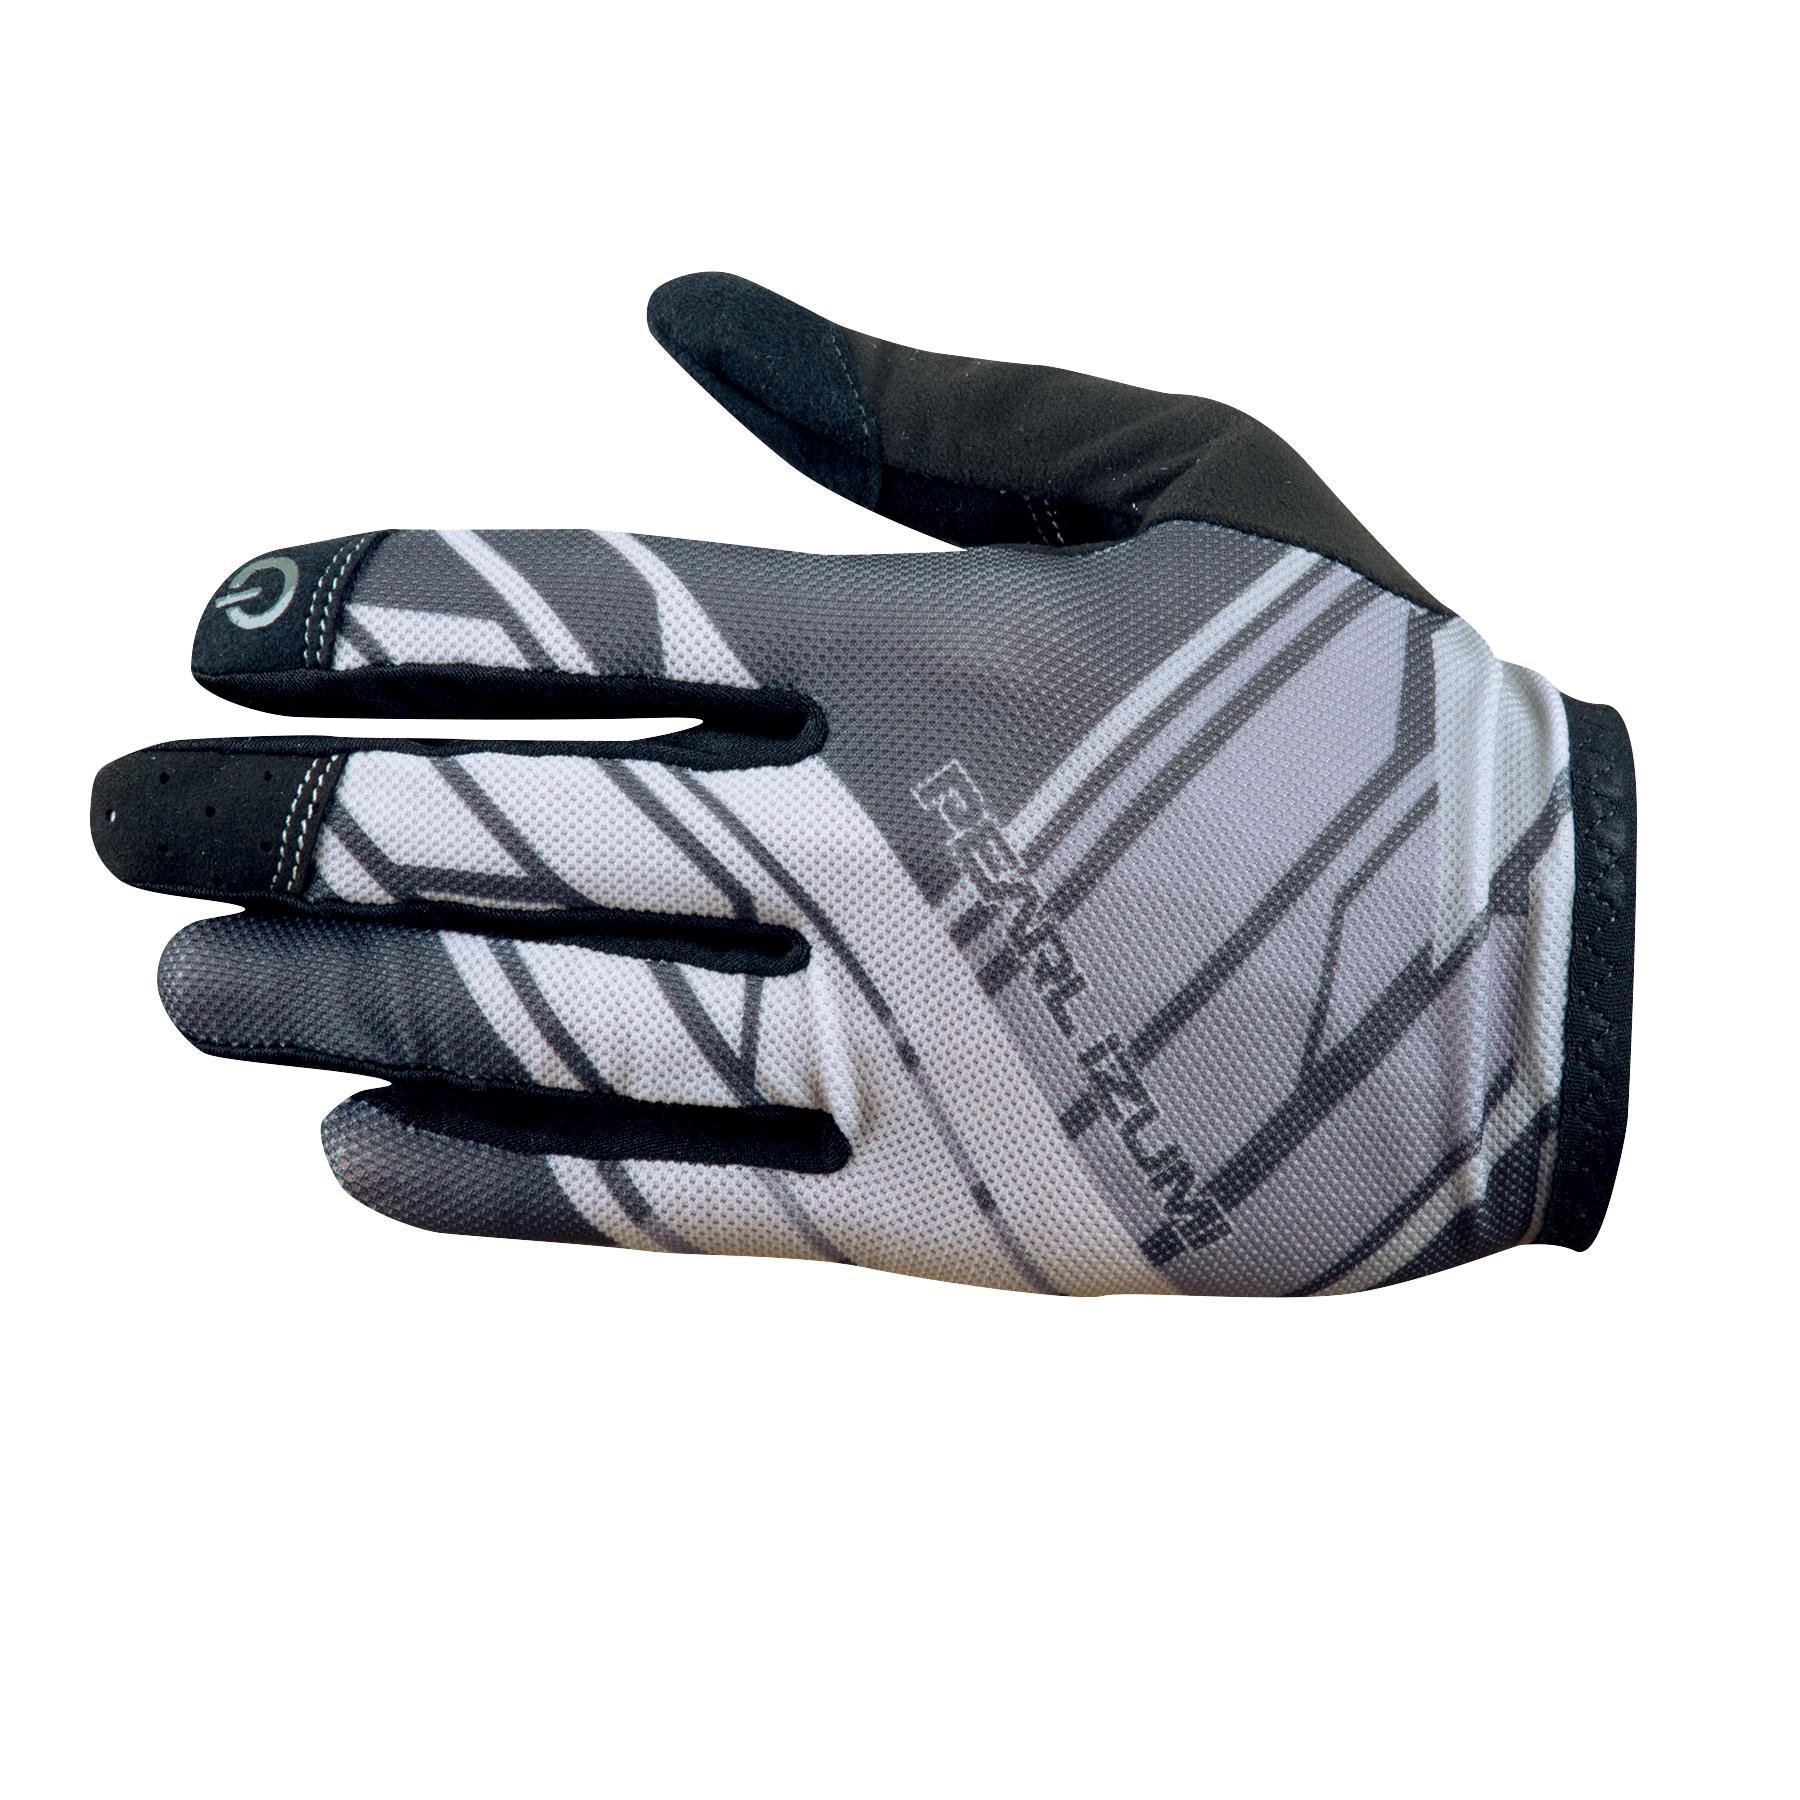 PEARL iZUMi DIVIDE rukavice, černá, XL